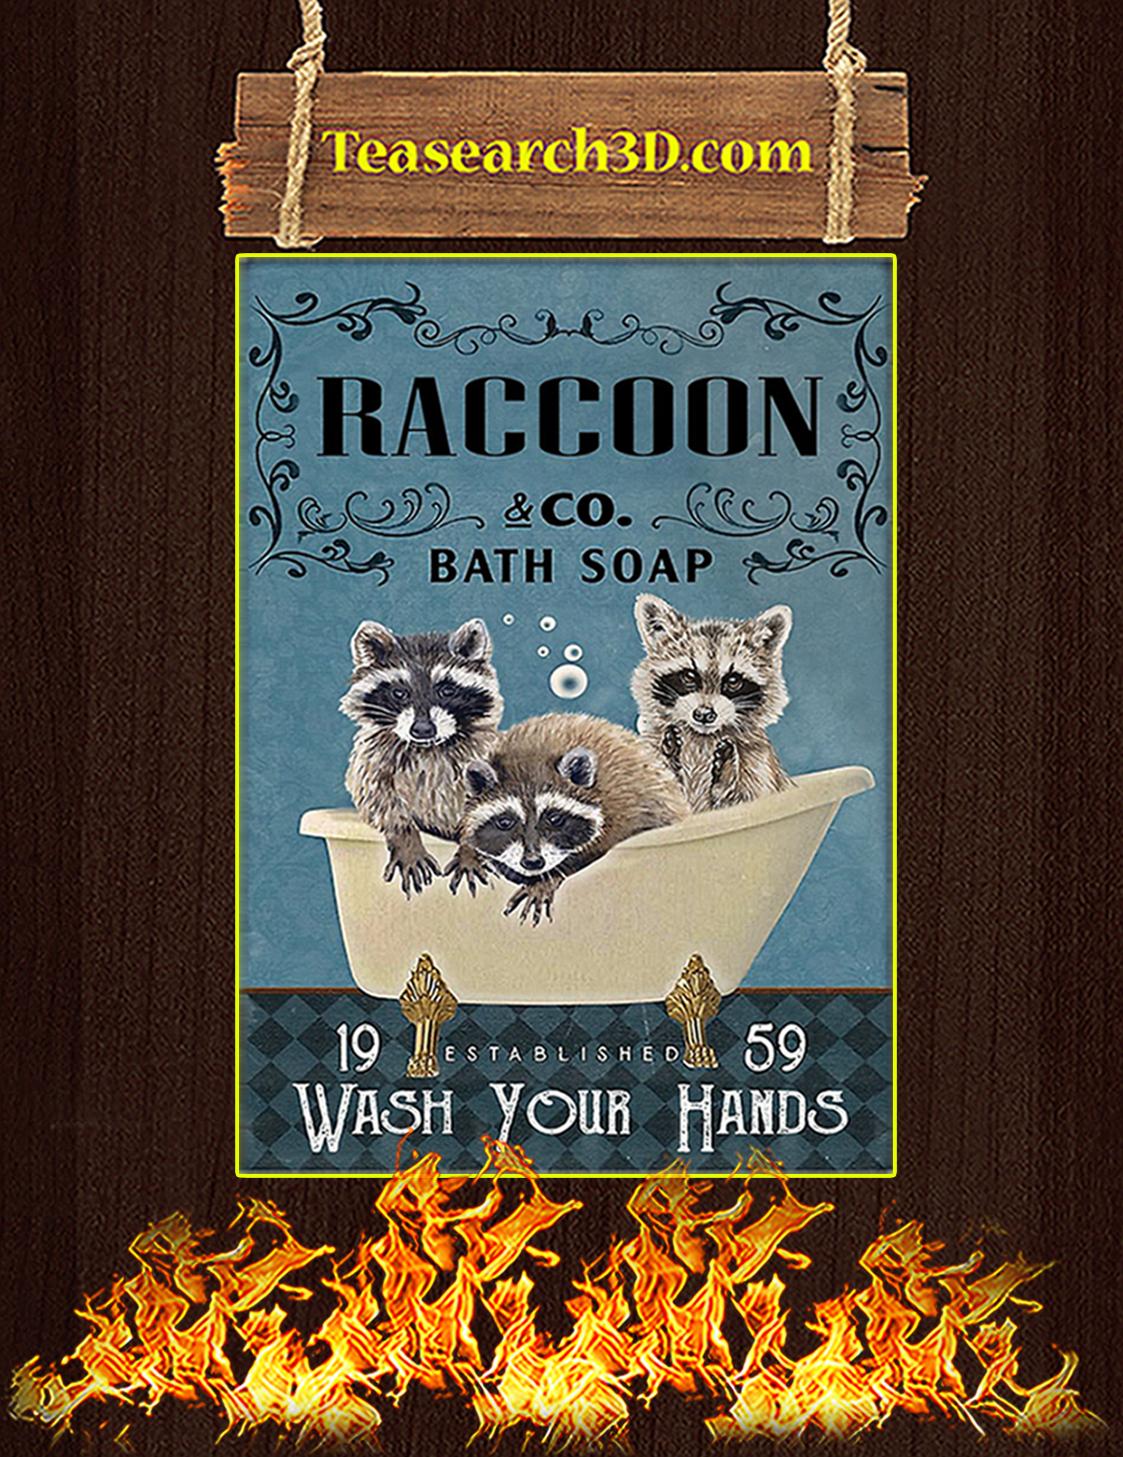 Raccoon Company Bath Soap Poster A3